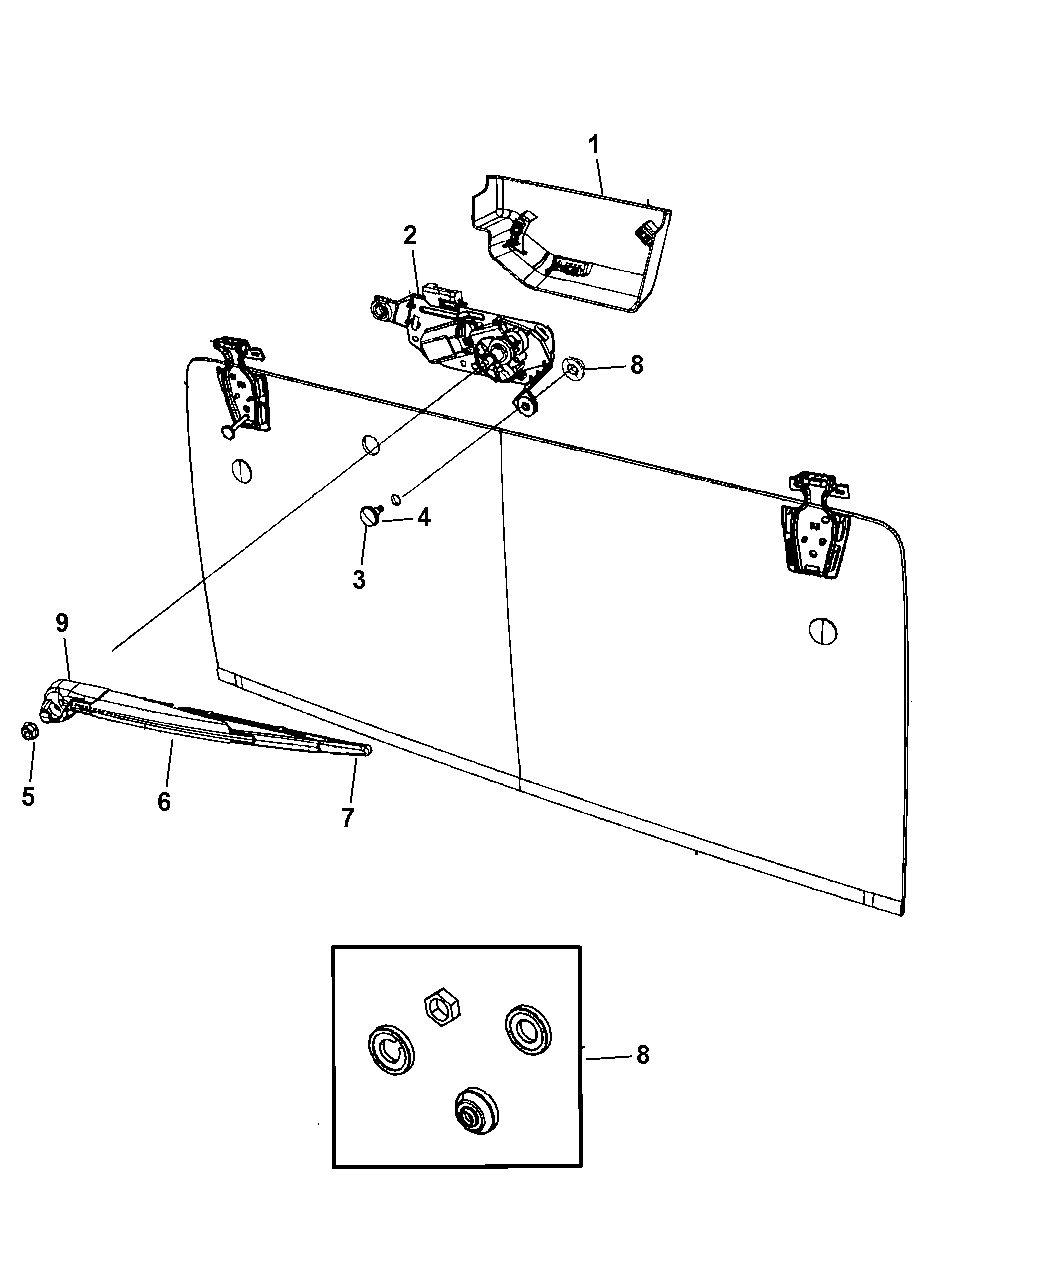 2015 Jeep Wrangler Rear Wiper System